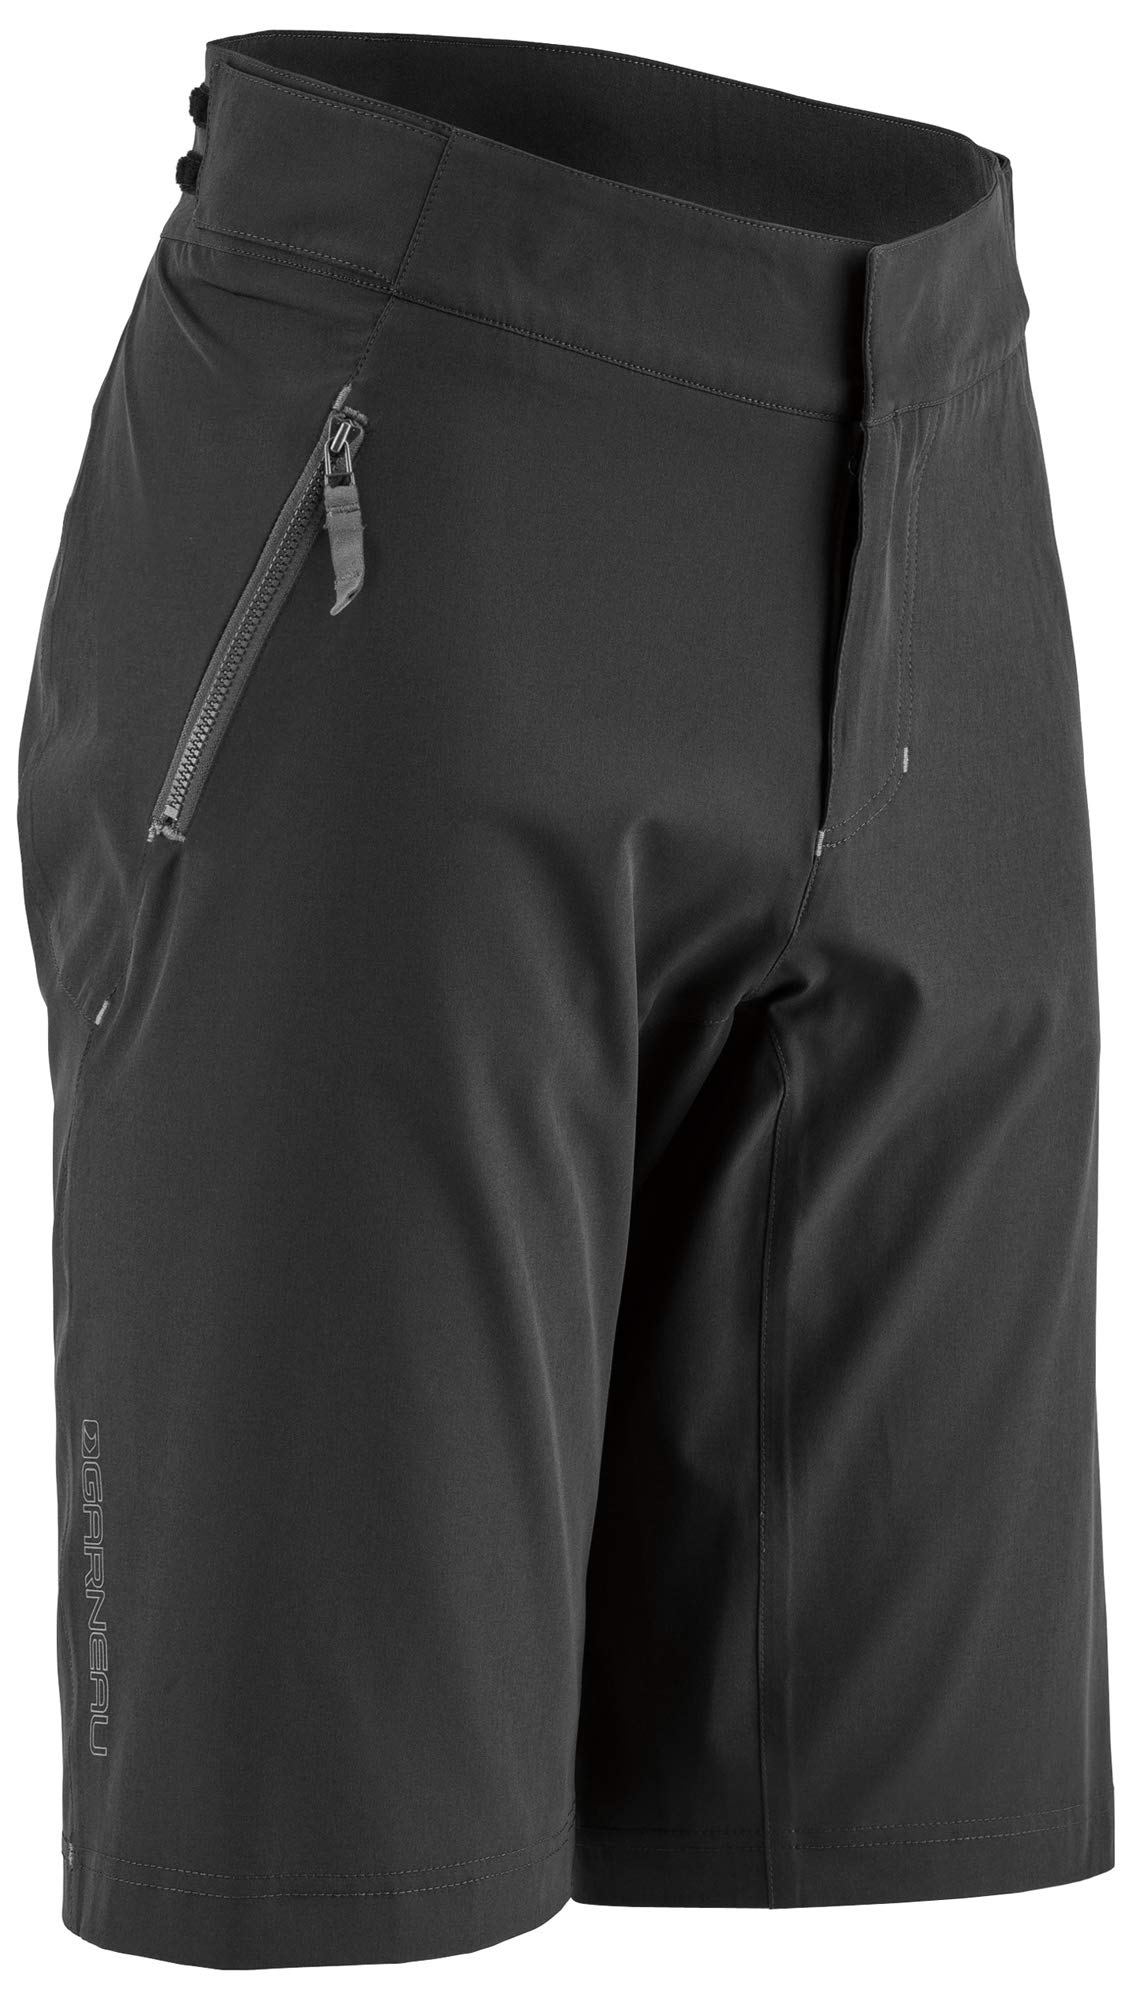 Louis Garneau Men's Leeway Bike Shorts, Black, Small